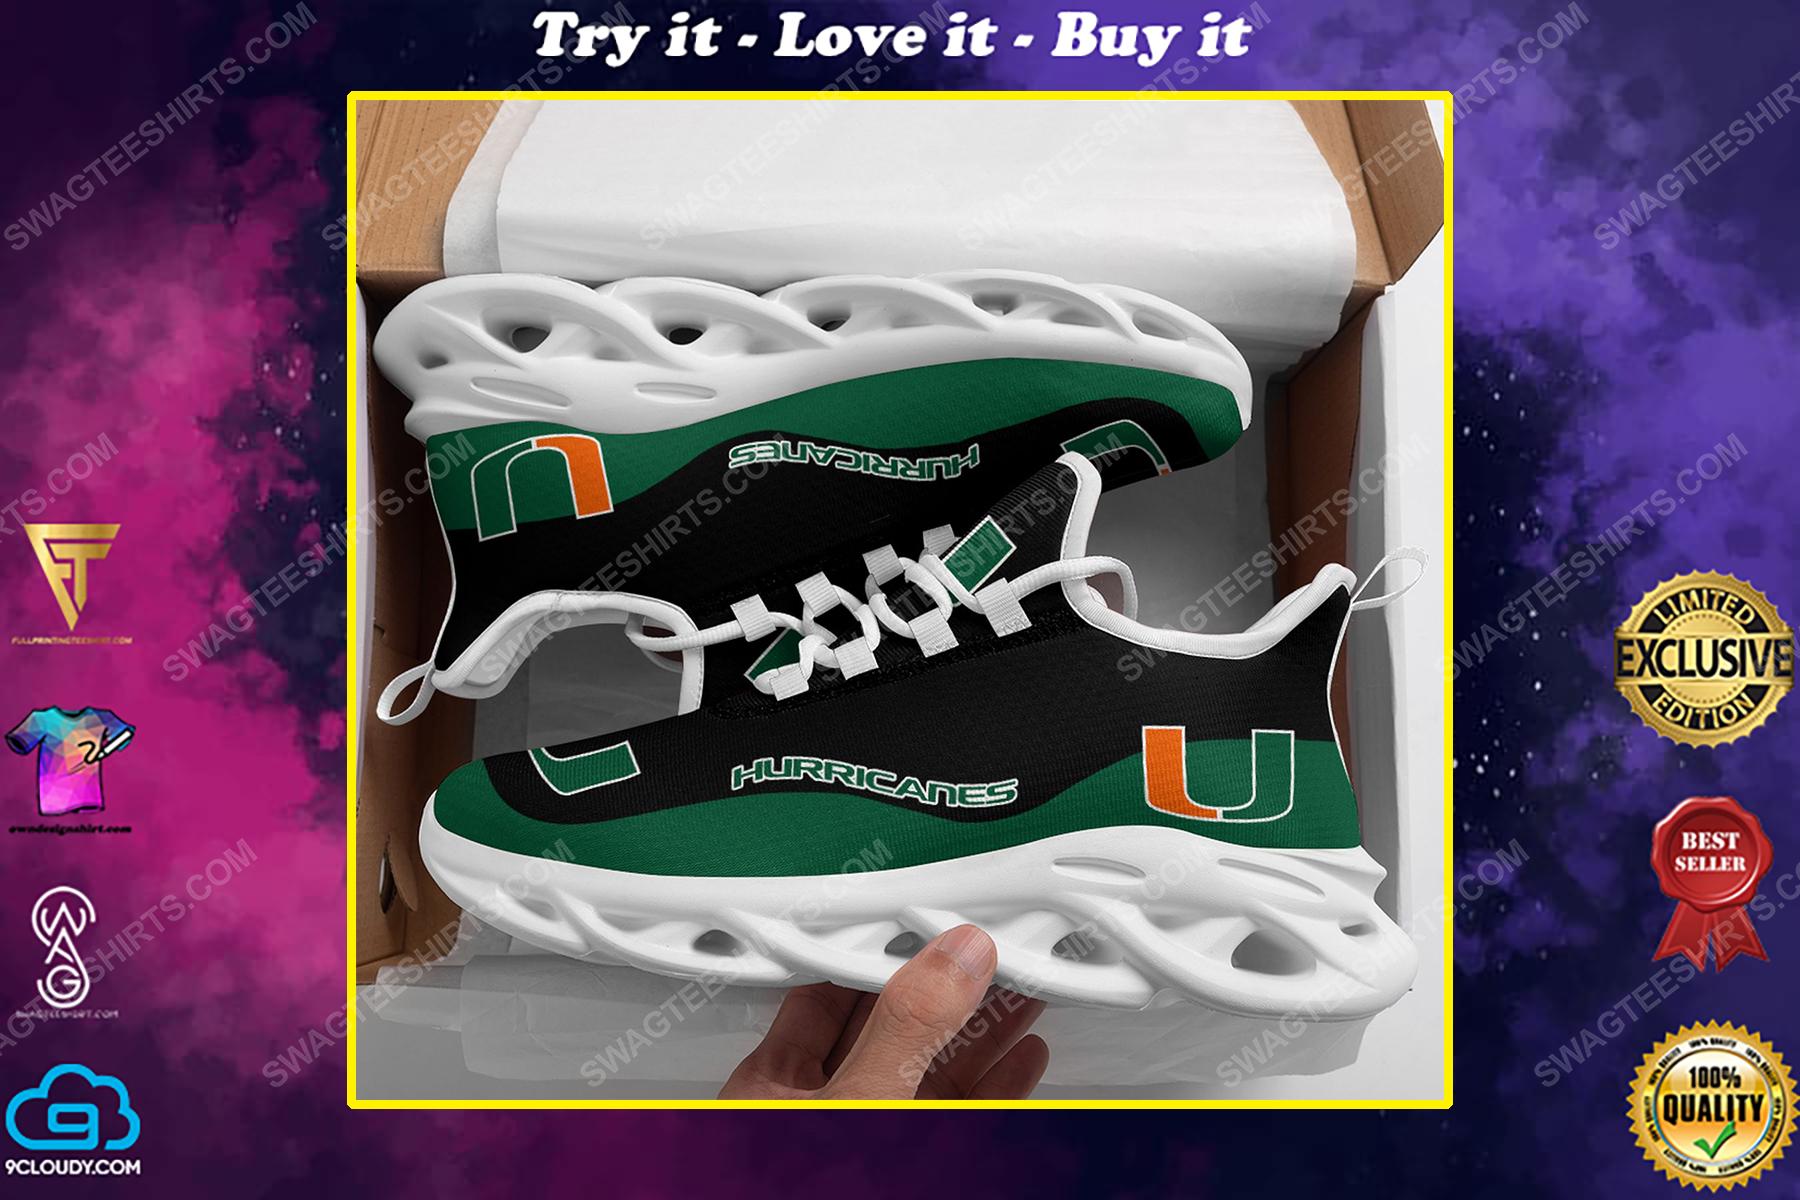 The miami hurricanes football team max soul shoes